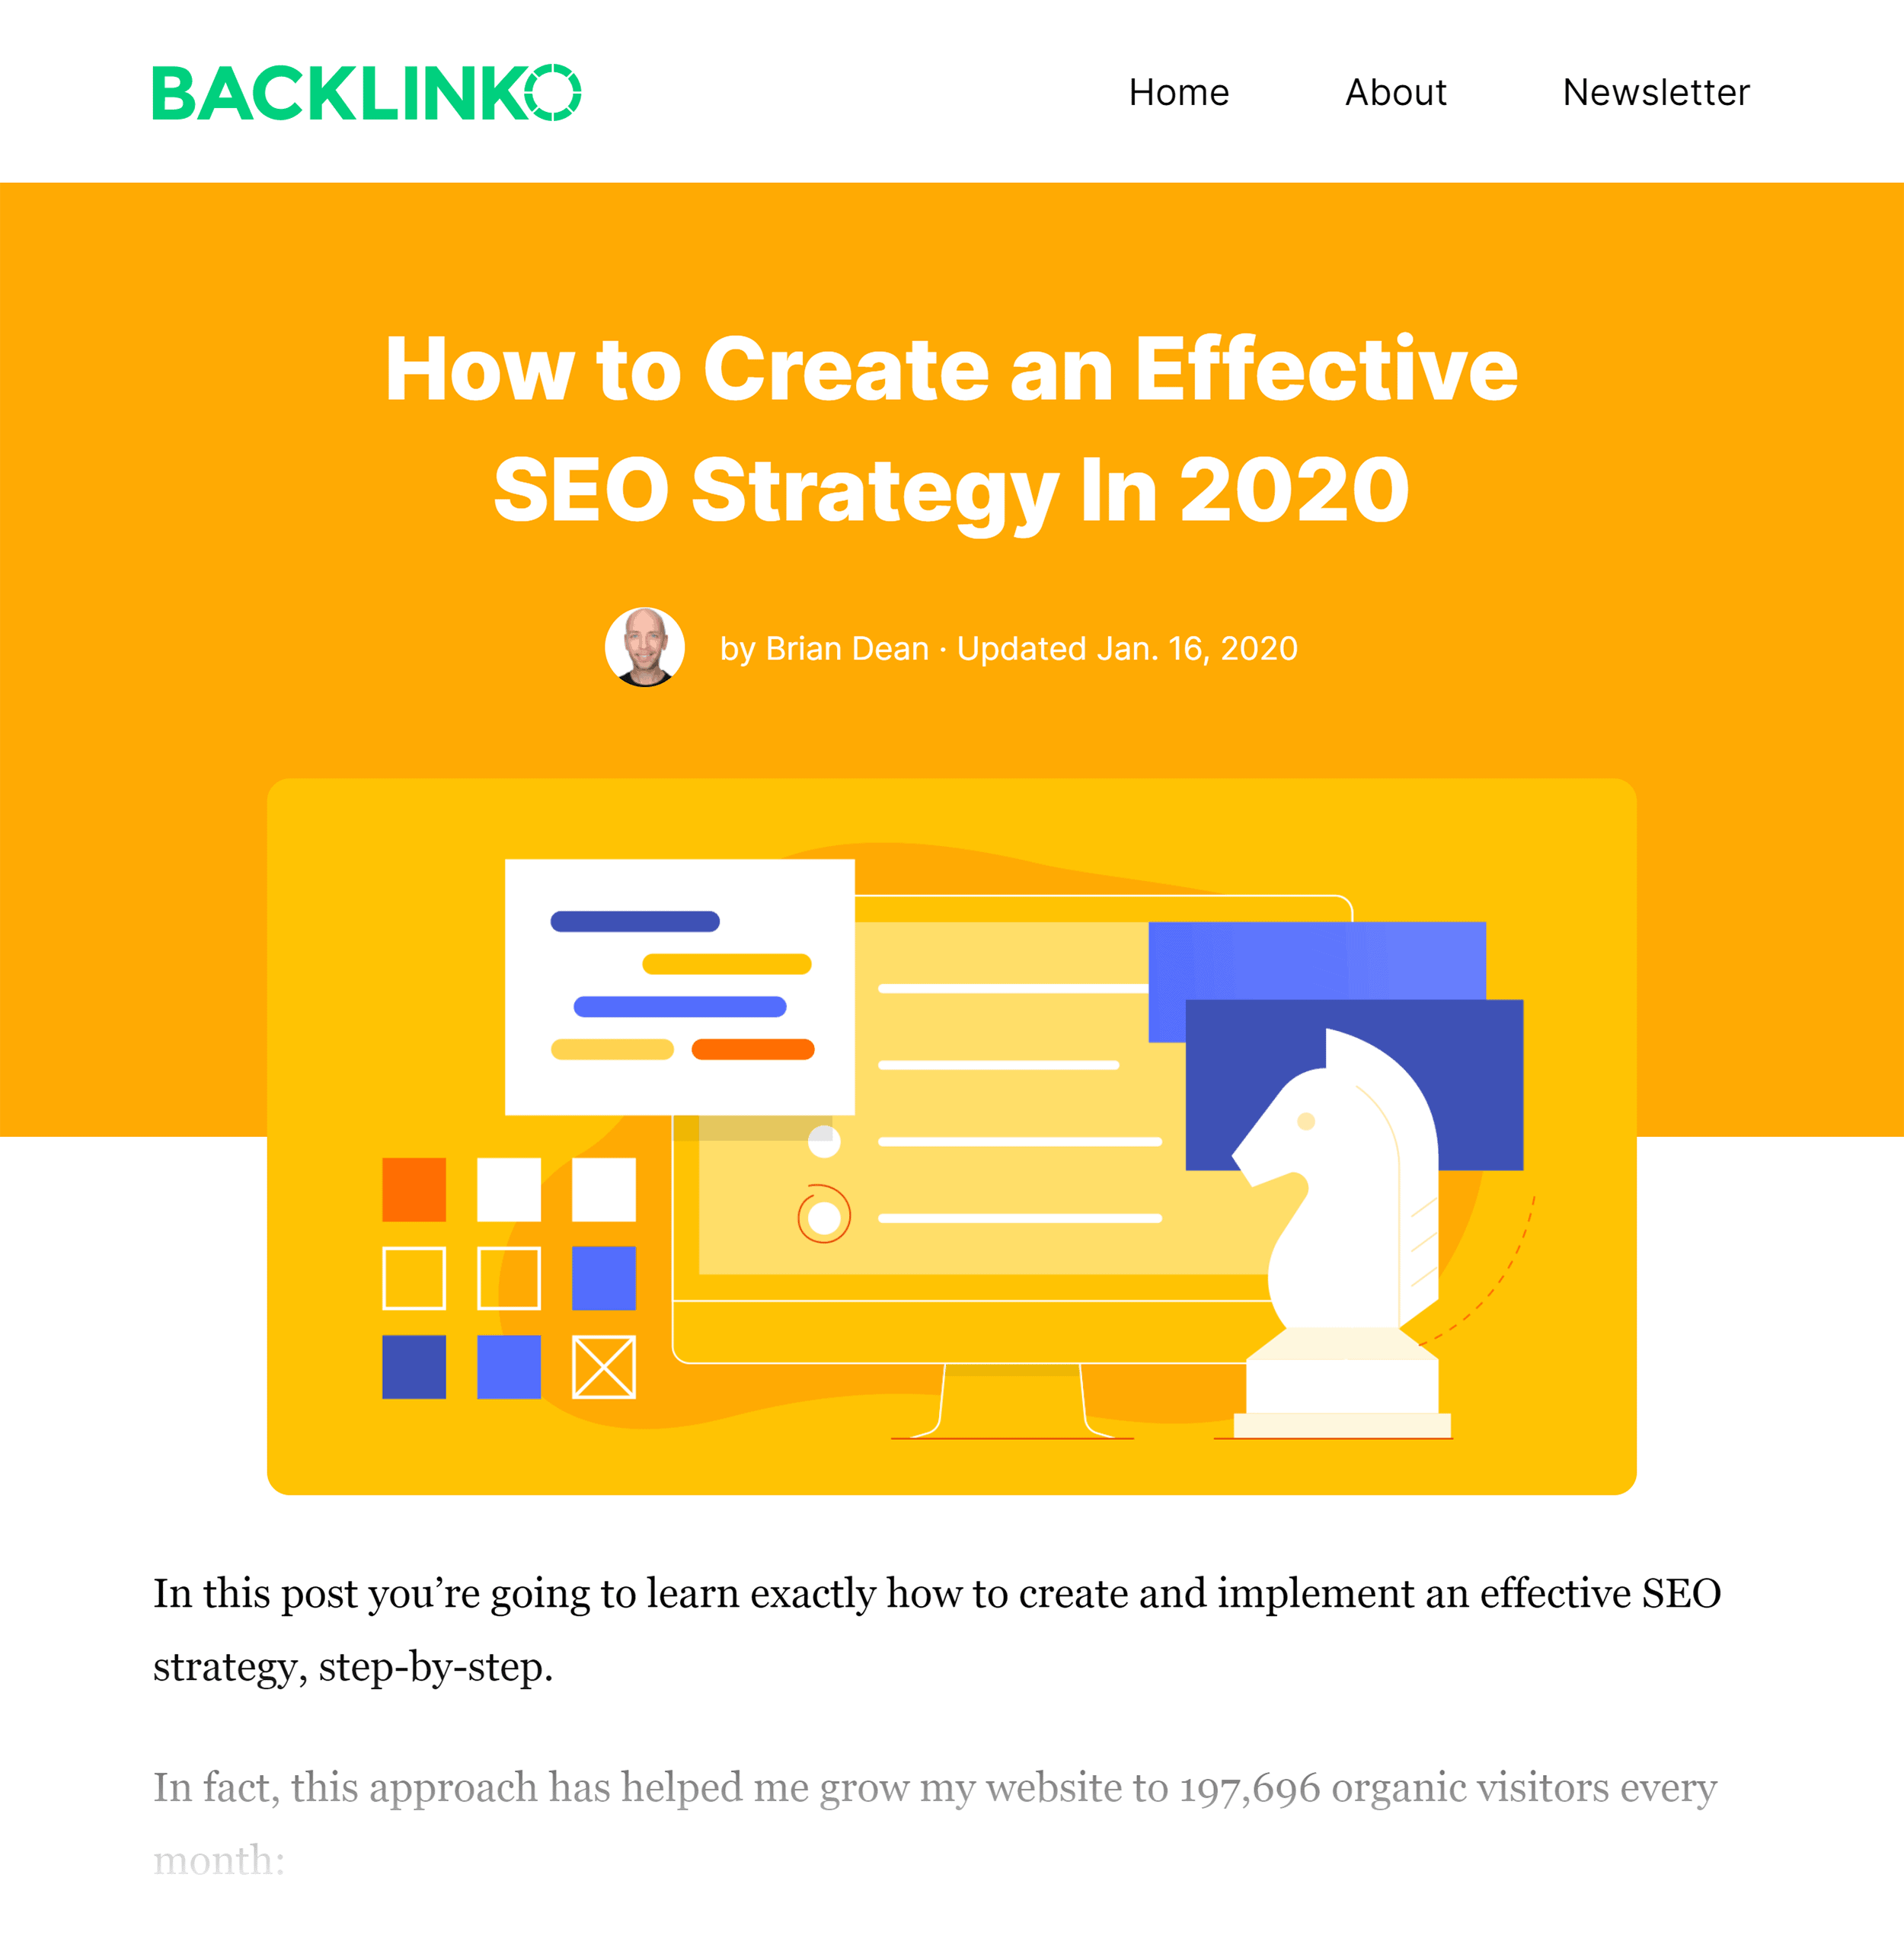 Backlinko – SEO Strategy Guide